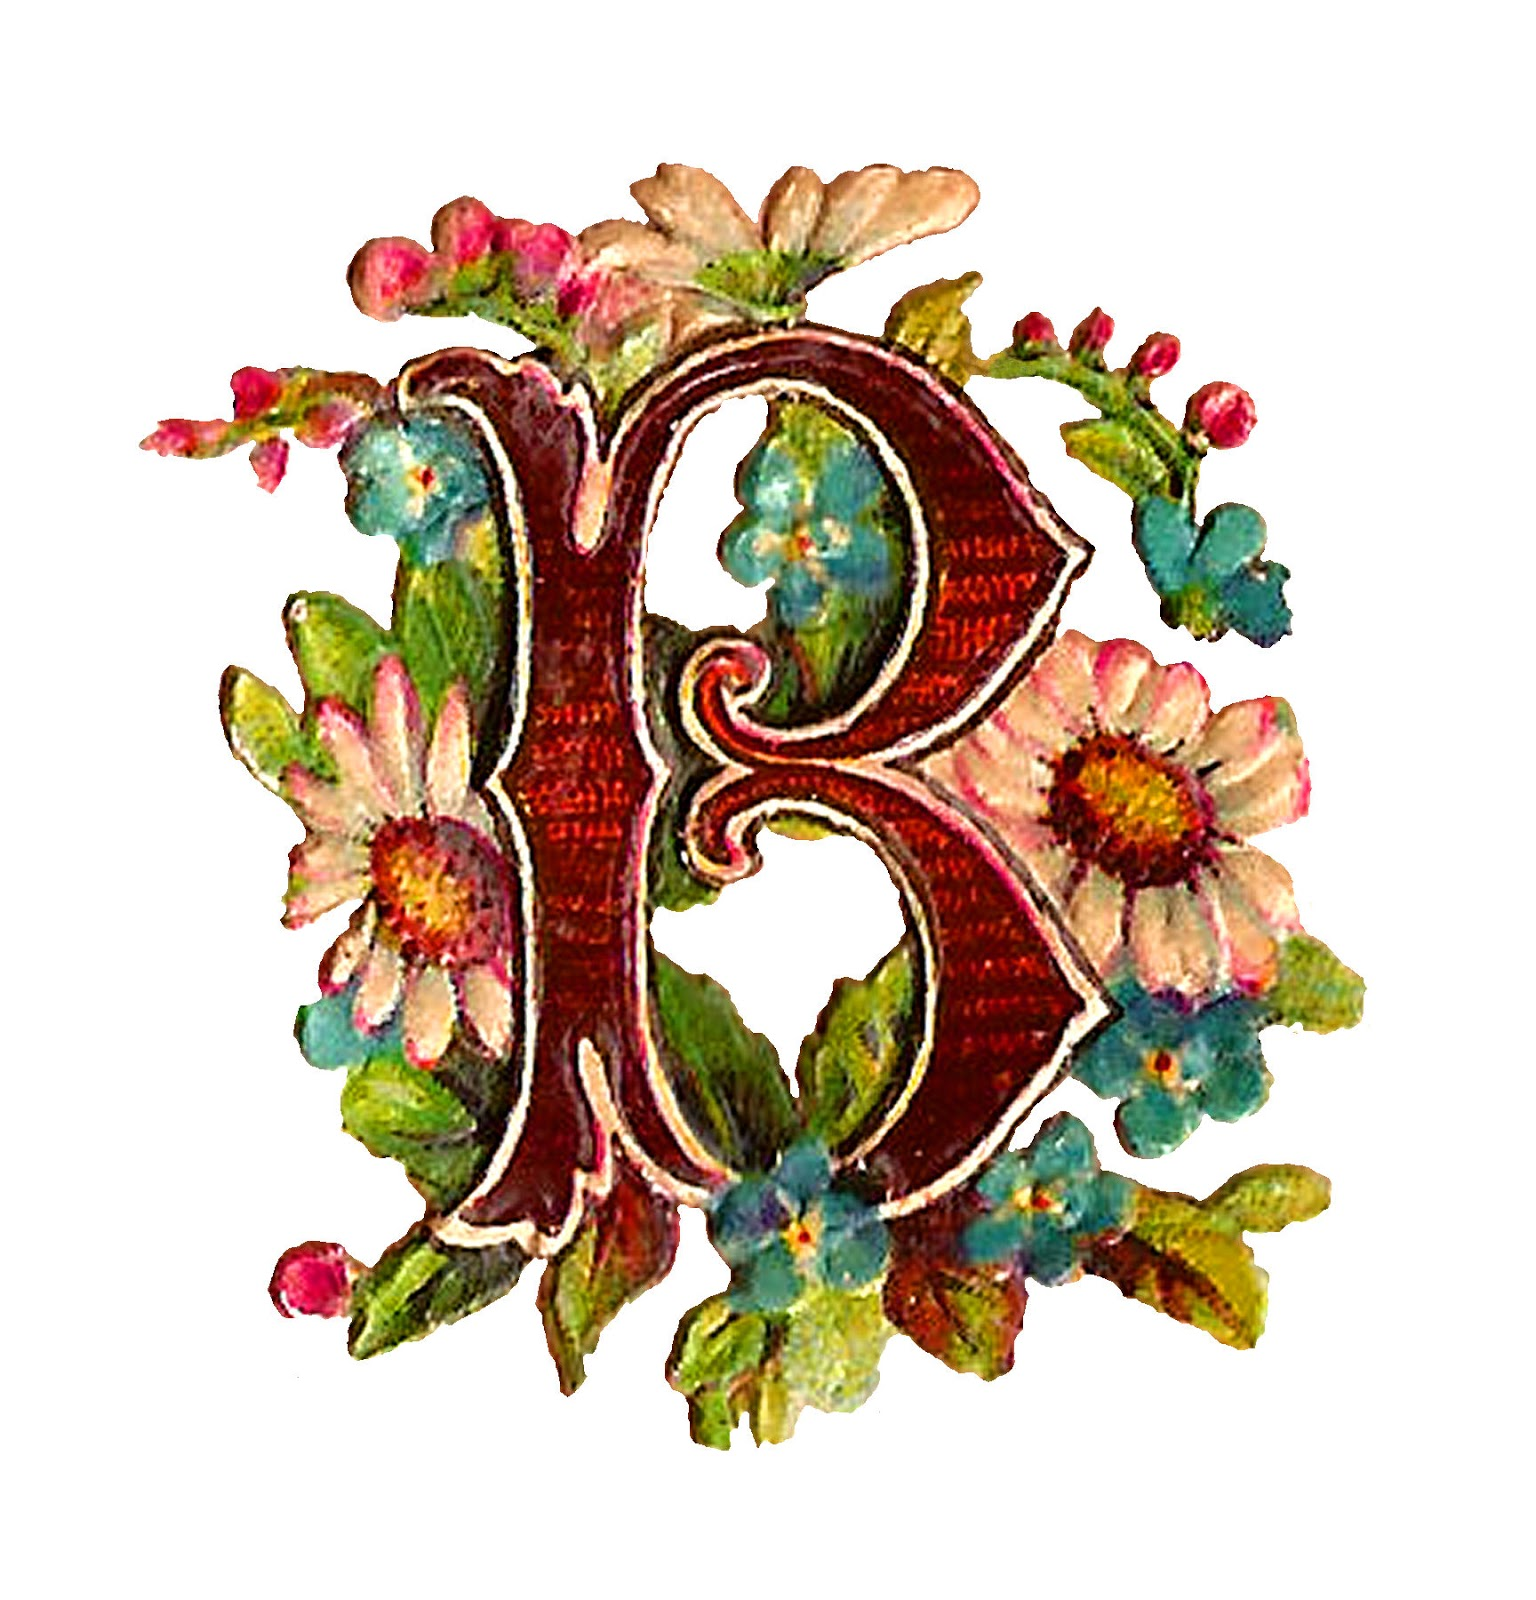 medium resolution of drop cap letter image crafting clipart floral design digital download